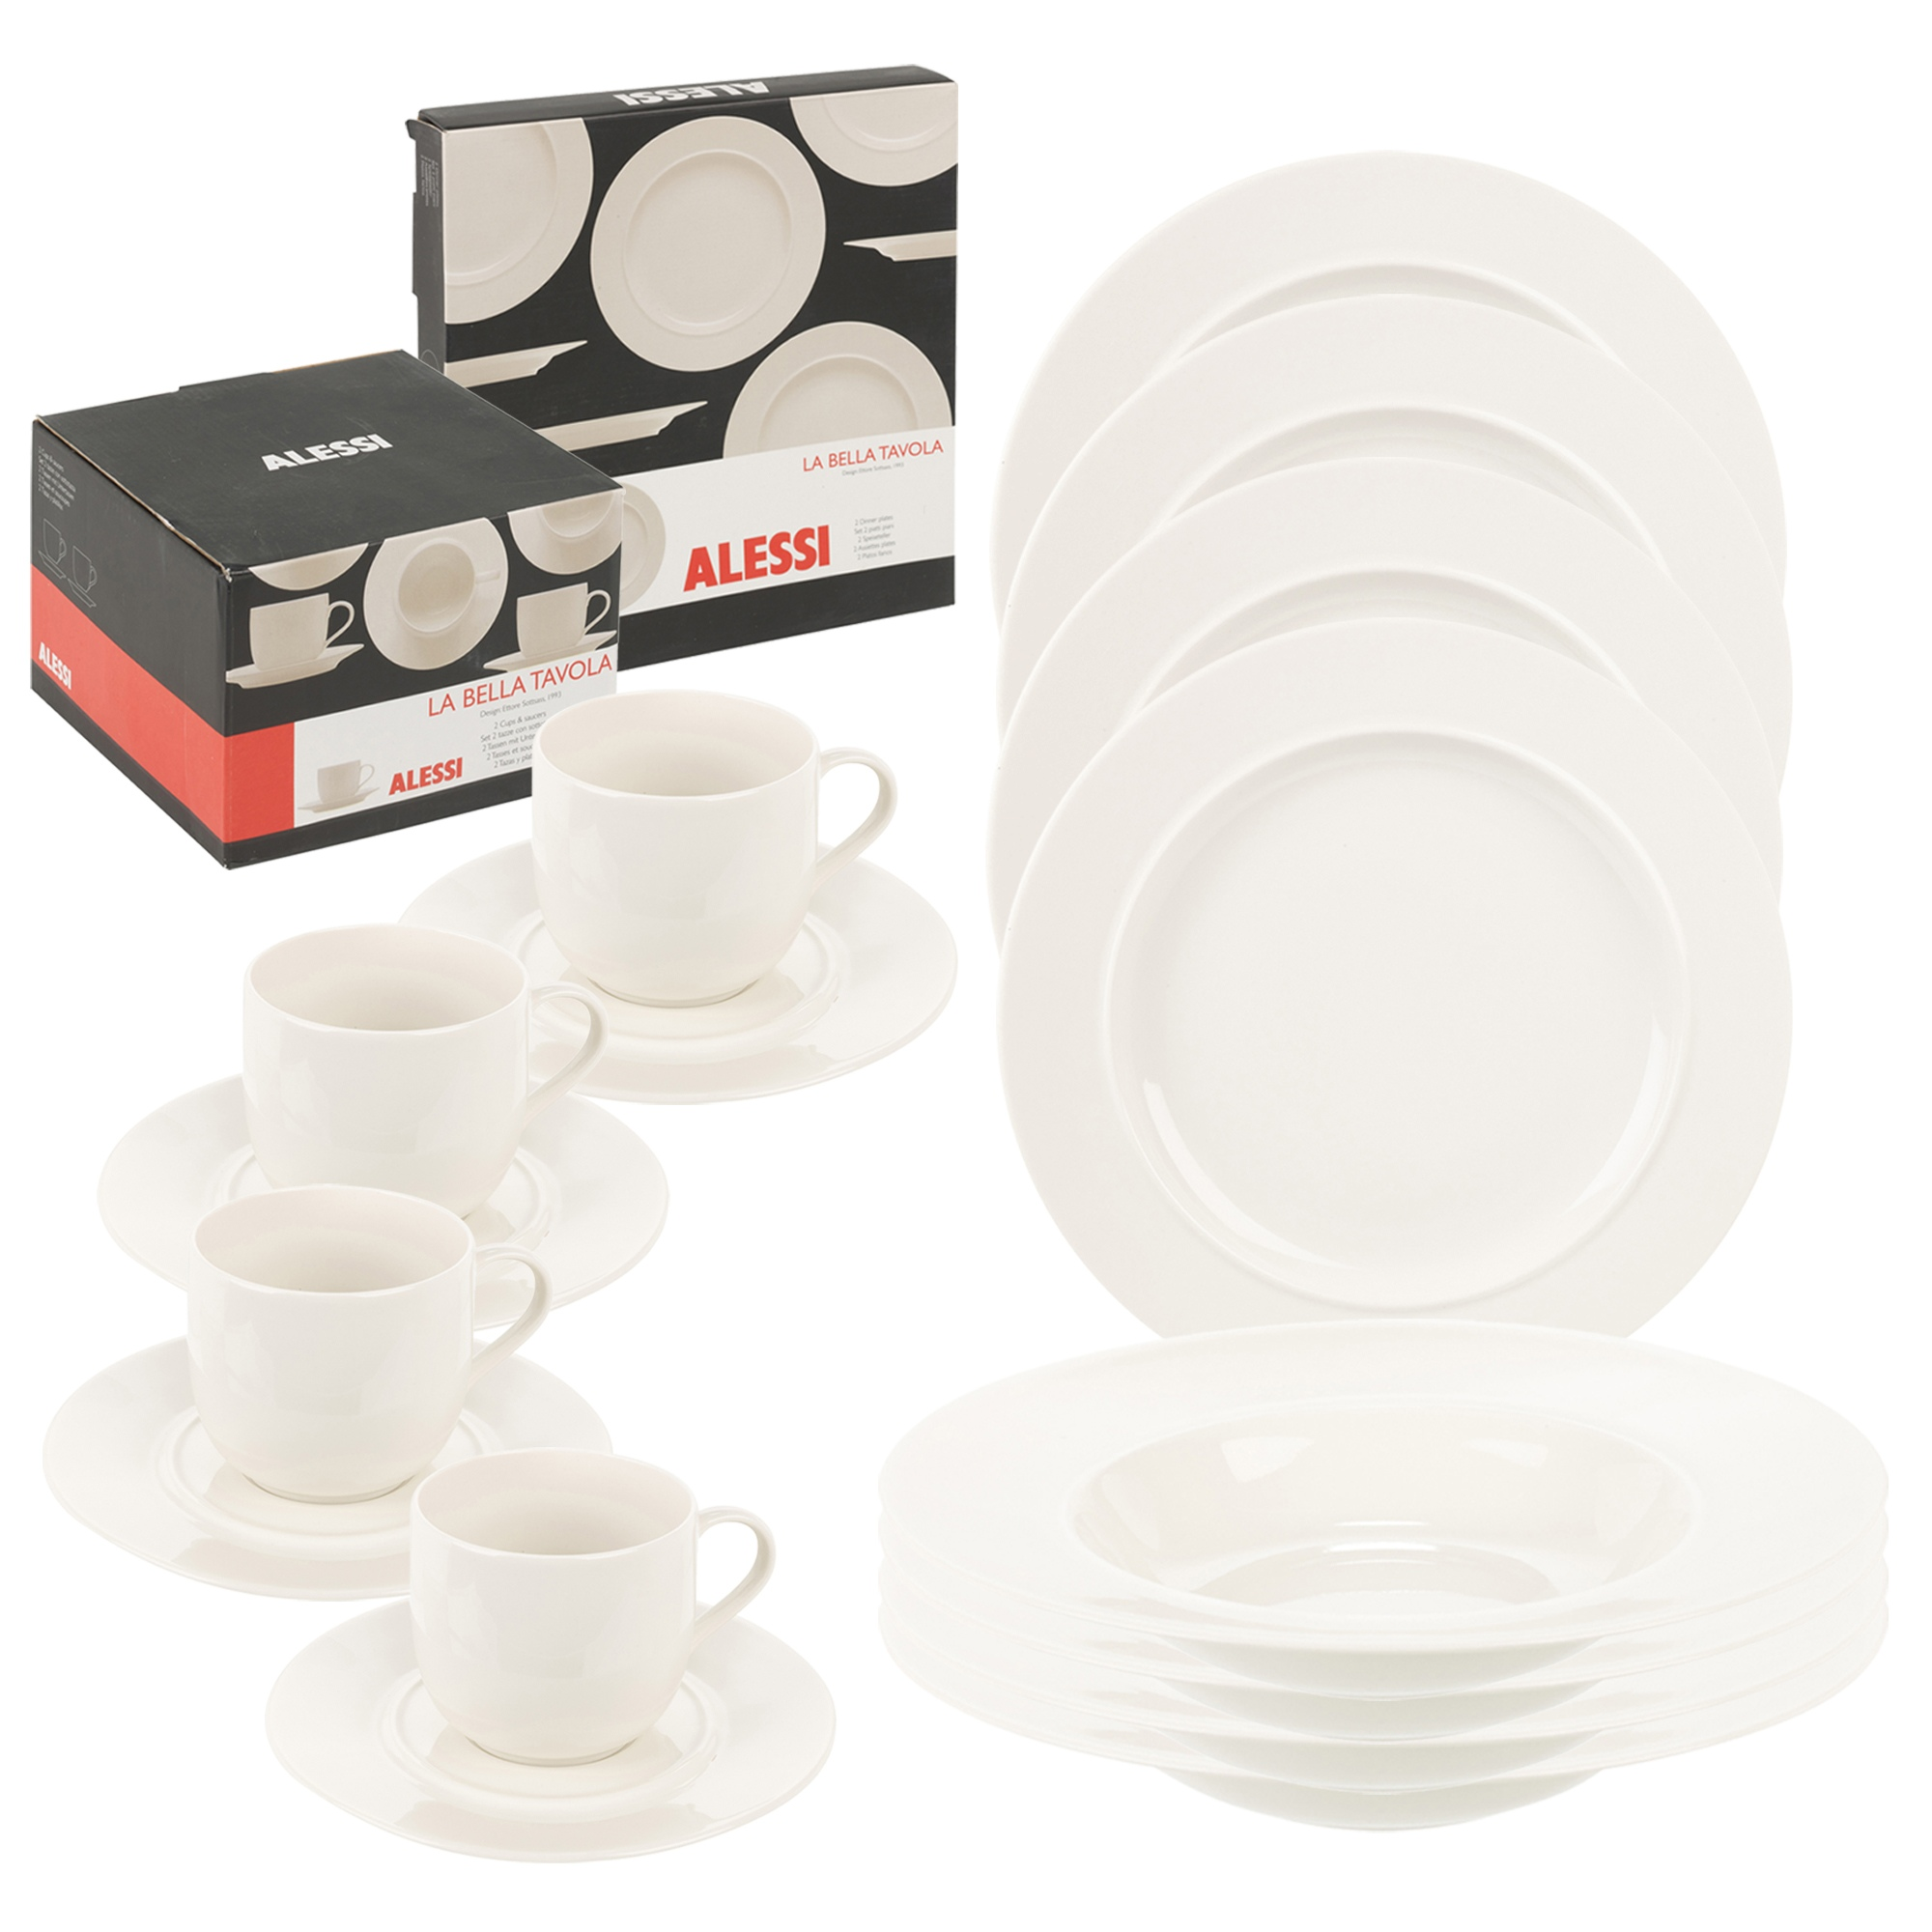 ALESSI La Bella Dishes. RRP From £79.99  sc 1 st  eBay & ALESSI La Bella Dinner Service Porcelain Tableware Dining Plate Bowl ...